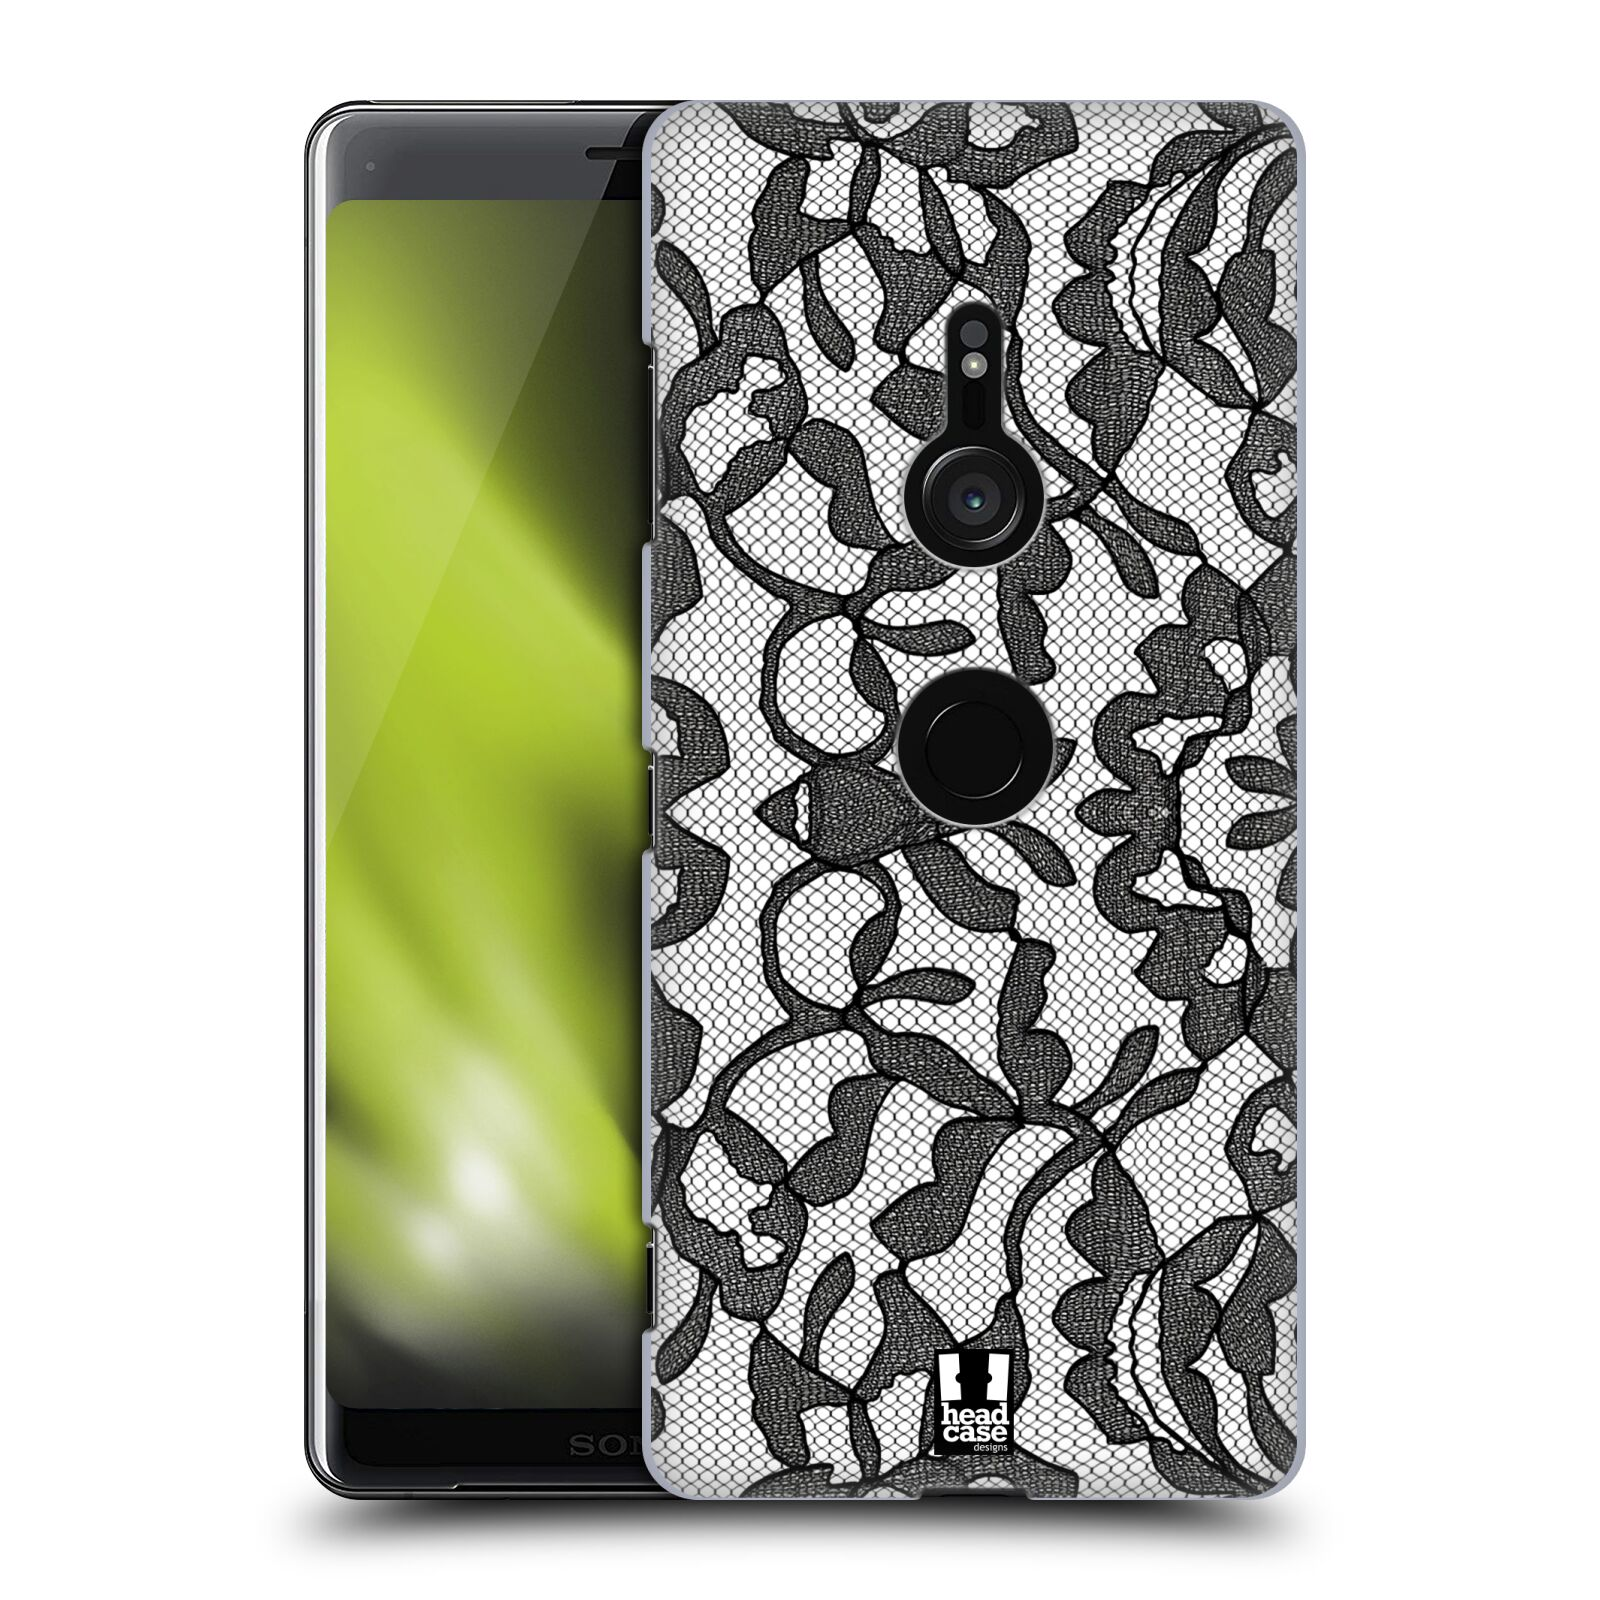 Plastové pouzdro na mobil Sony Xperia XZ3 - Head Case - LEAFY KRAJKA